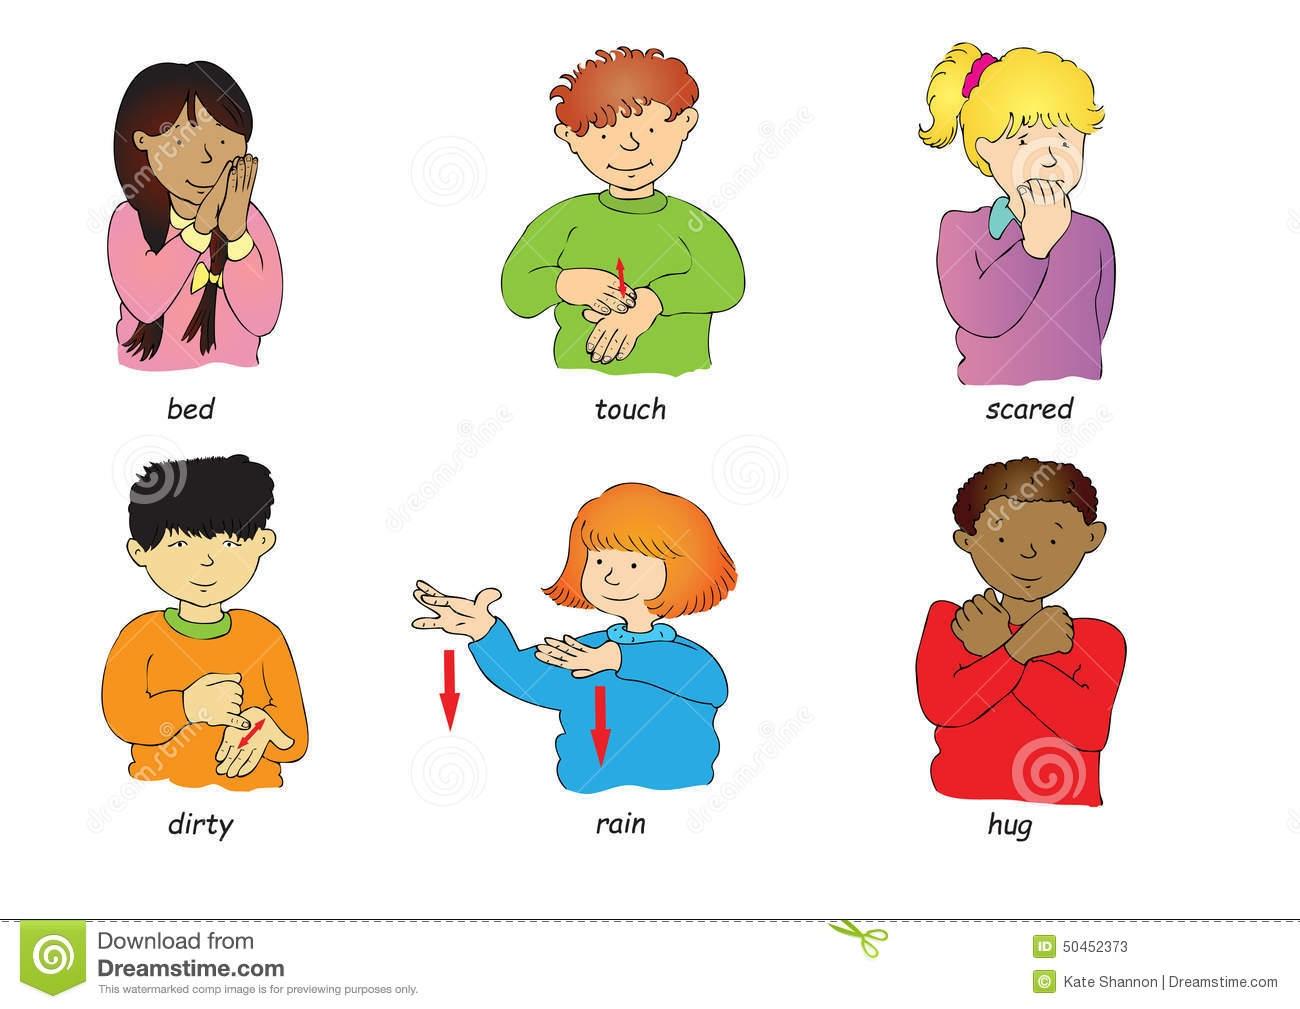 Sign language clipart kids jpg royalty free library Sign Language Clipart Kids - clipartsgram.com jpg royalty free library